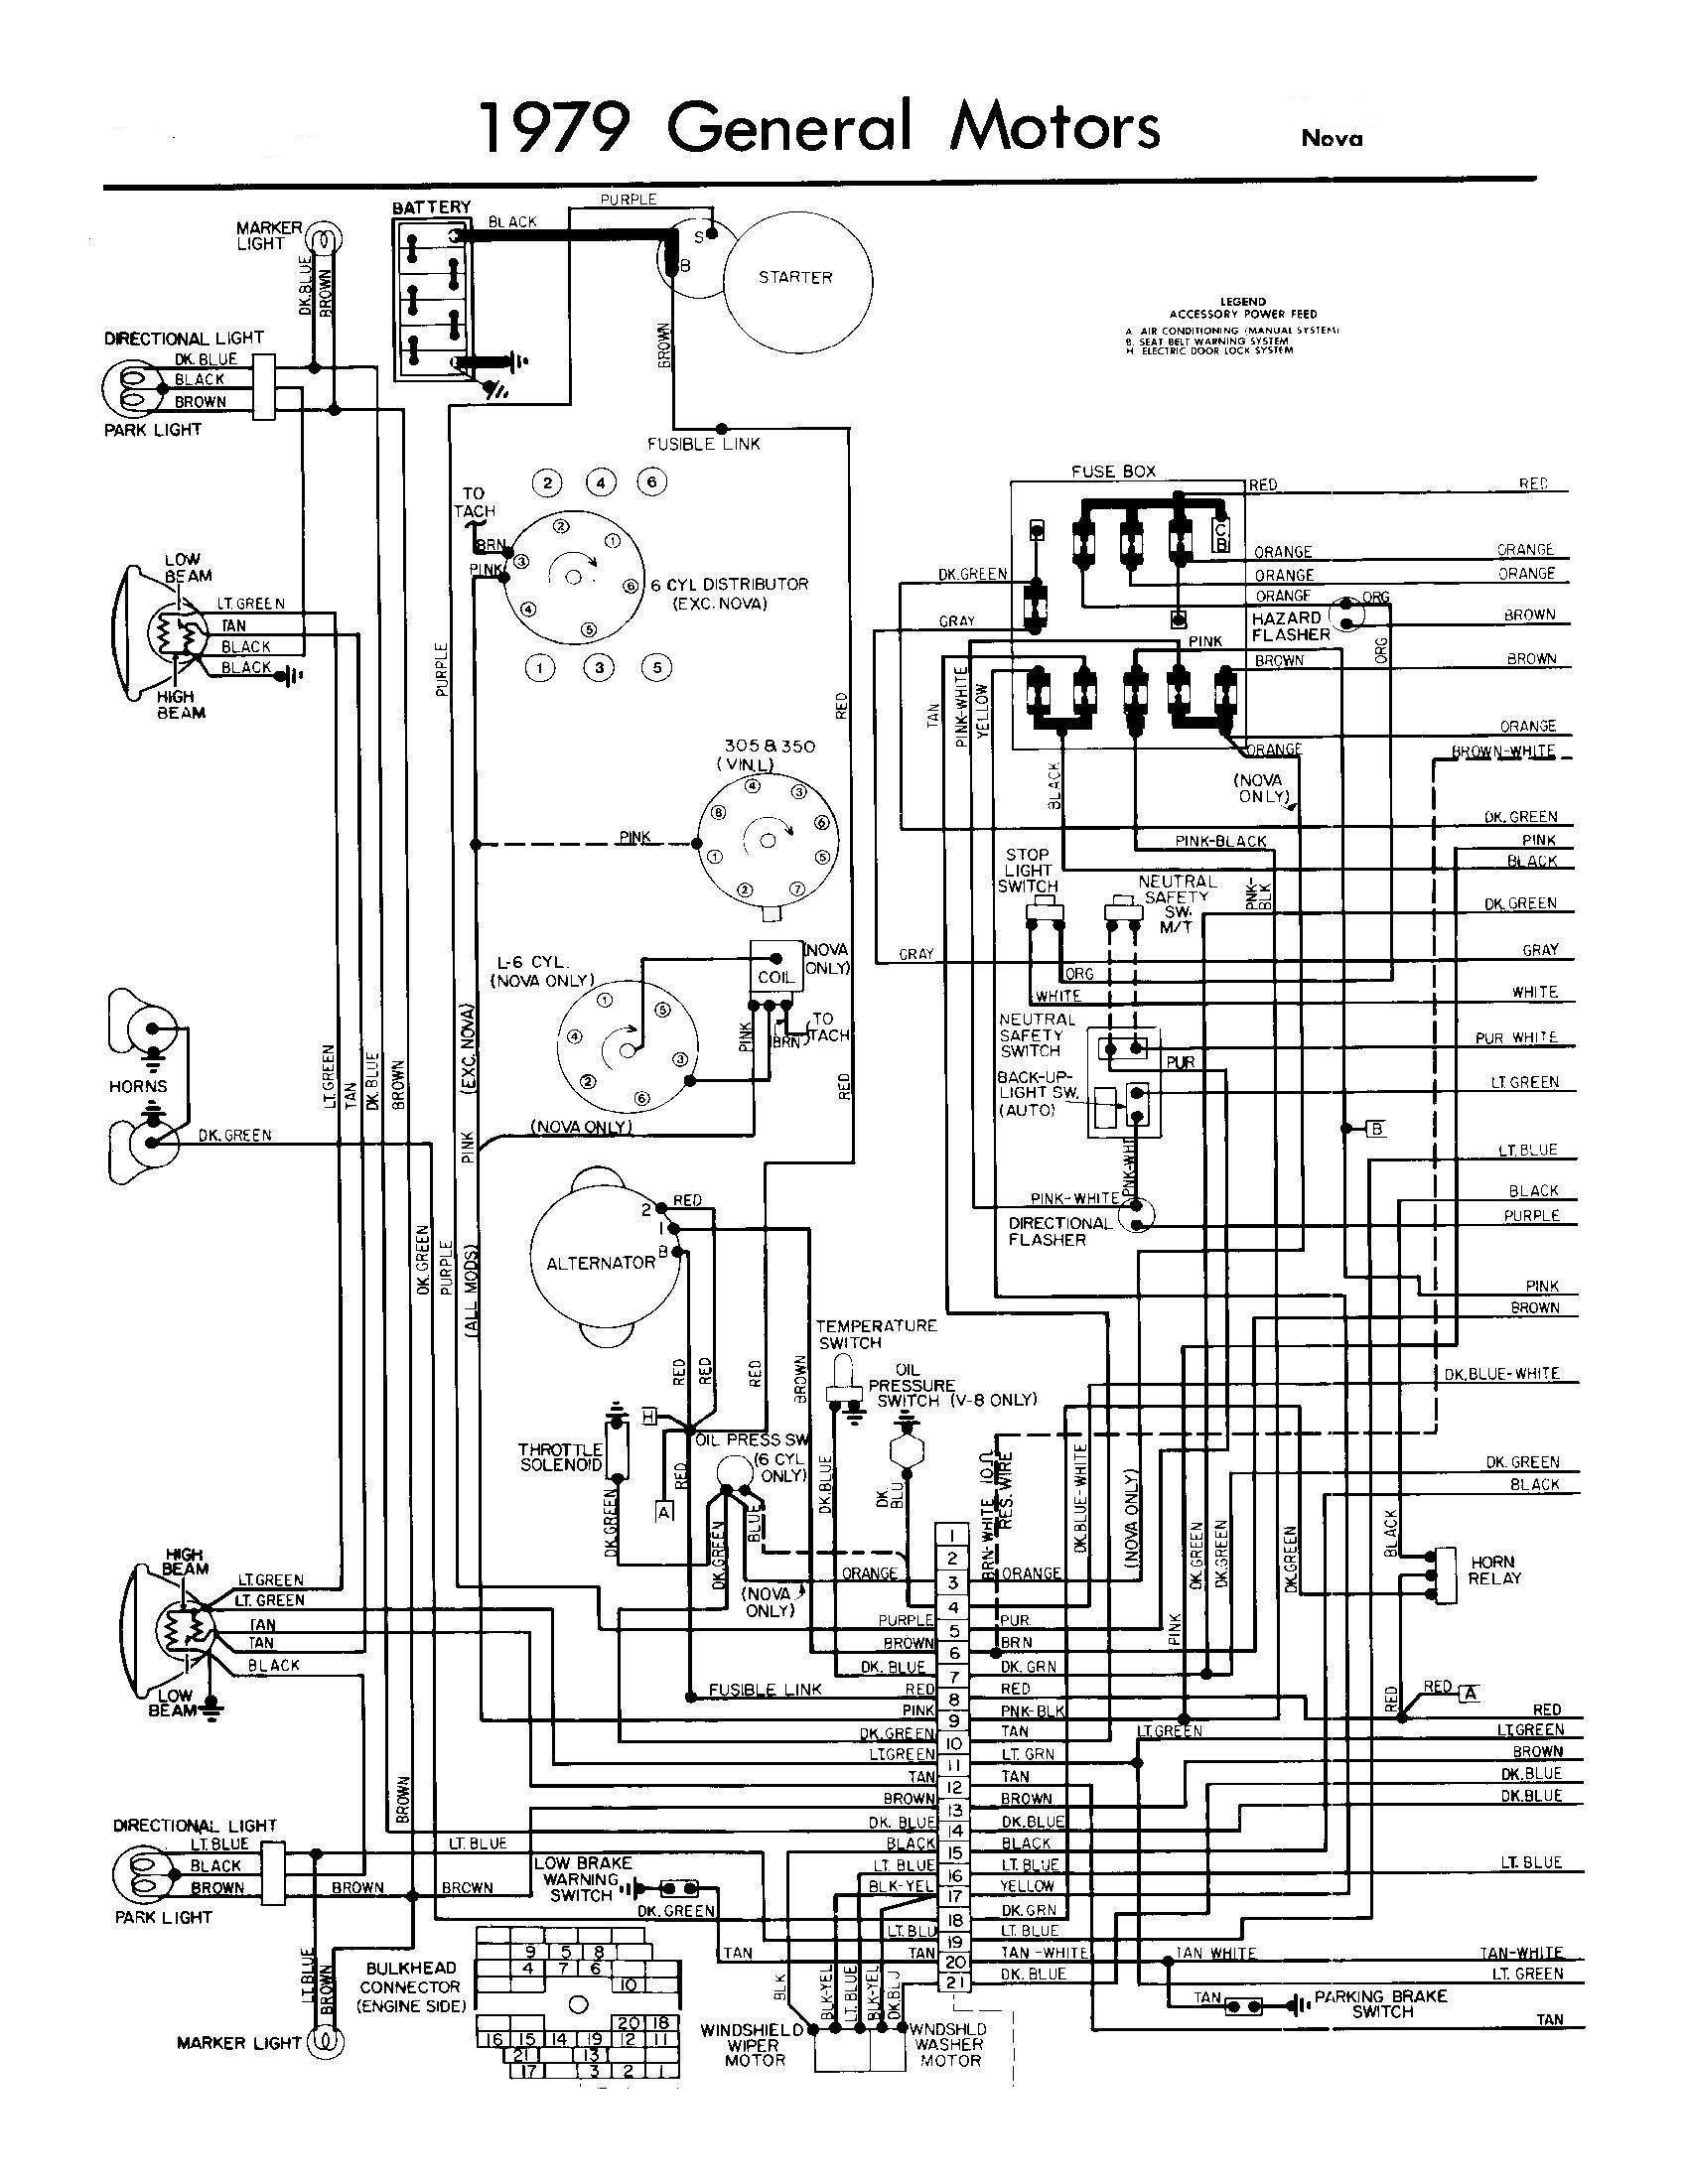 79 Chevy Truck Wiring Diagram Chevy Trucks 1979 Chevy Truck 79 Chevy Truck